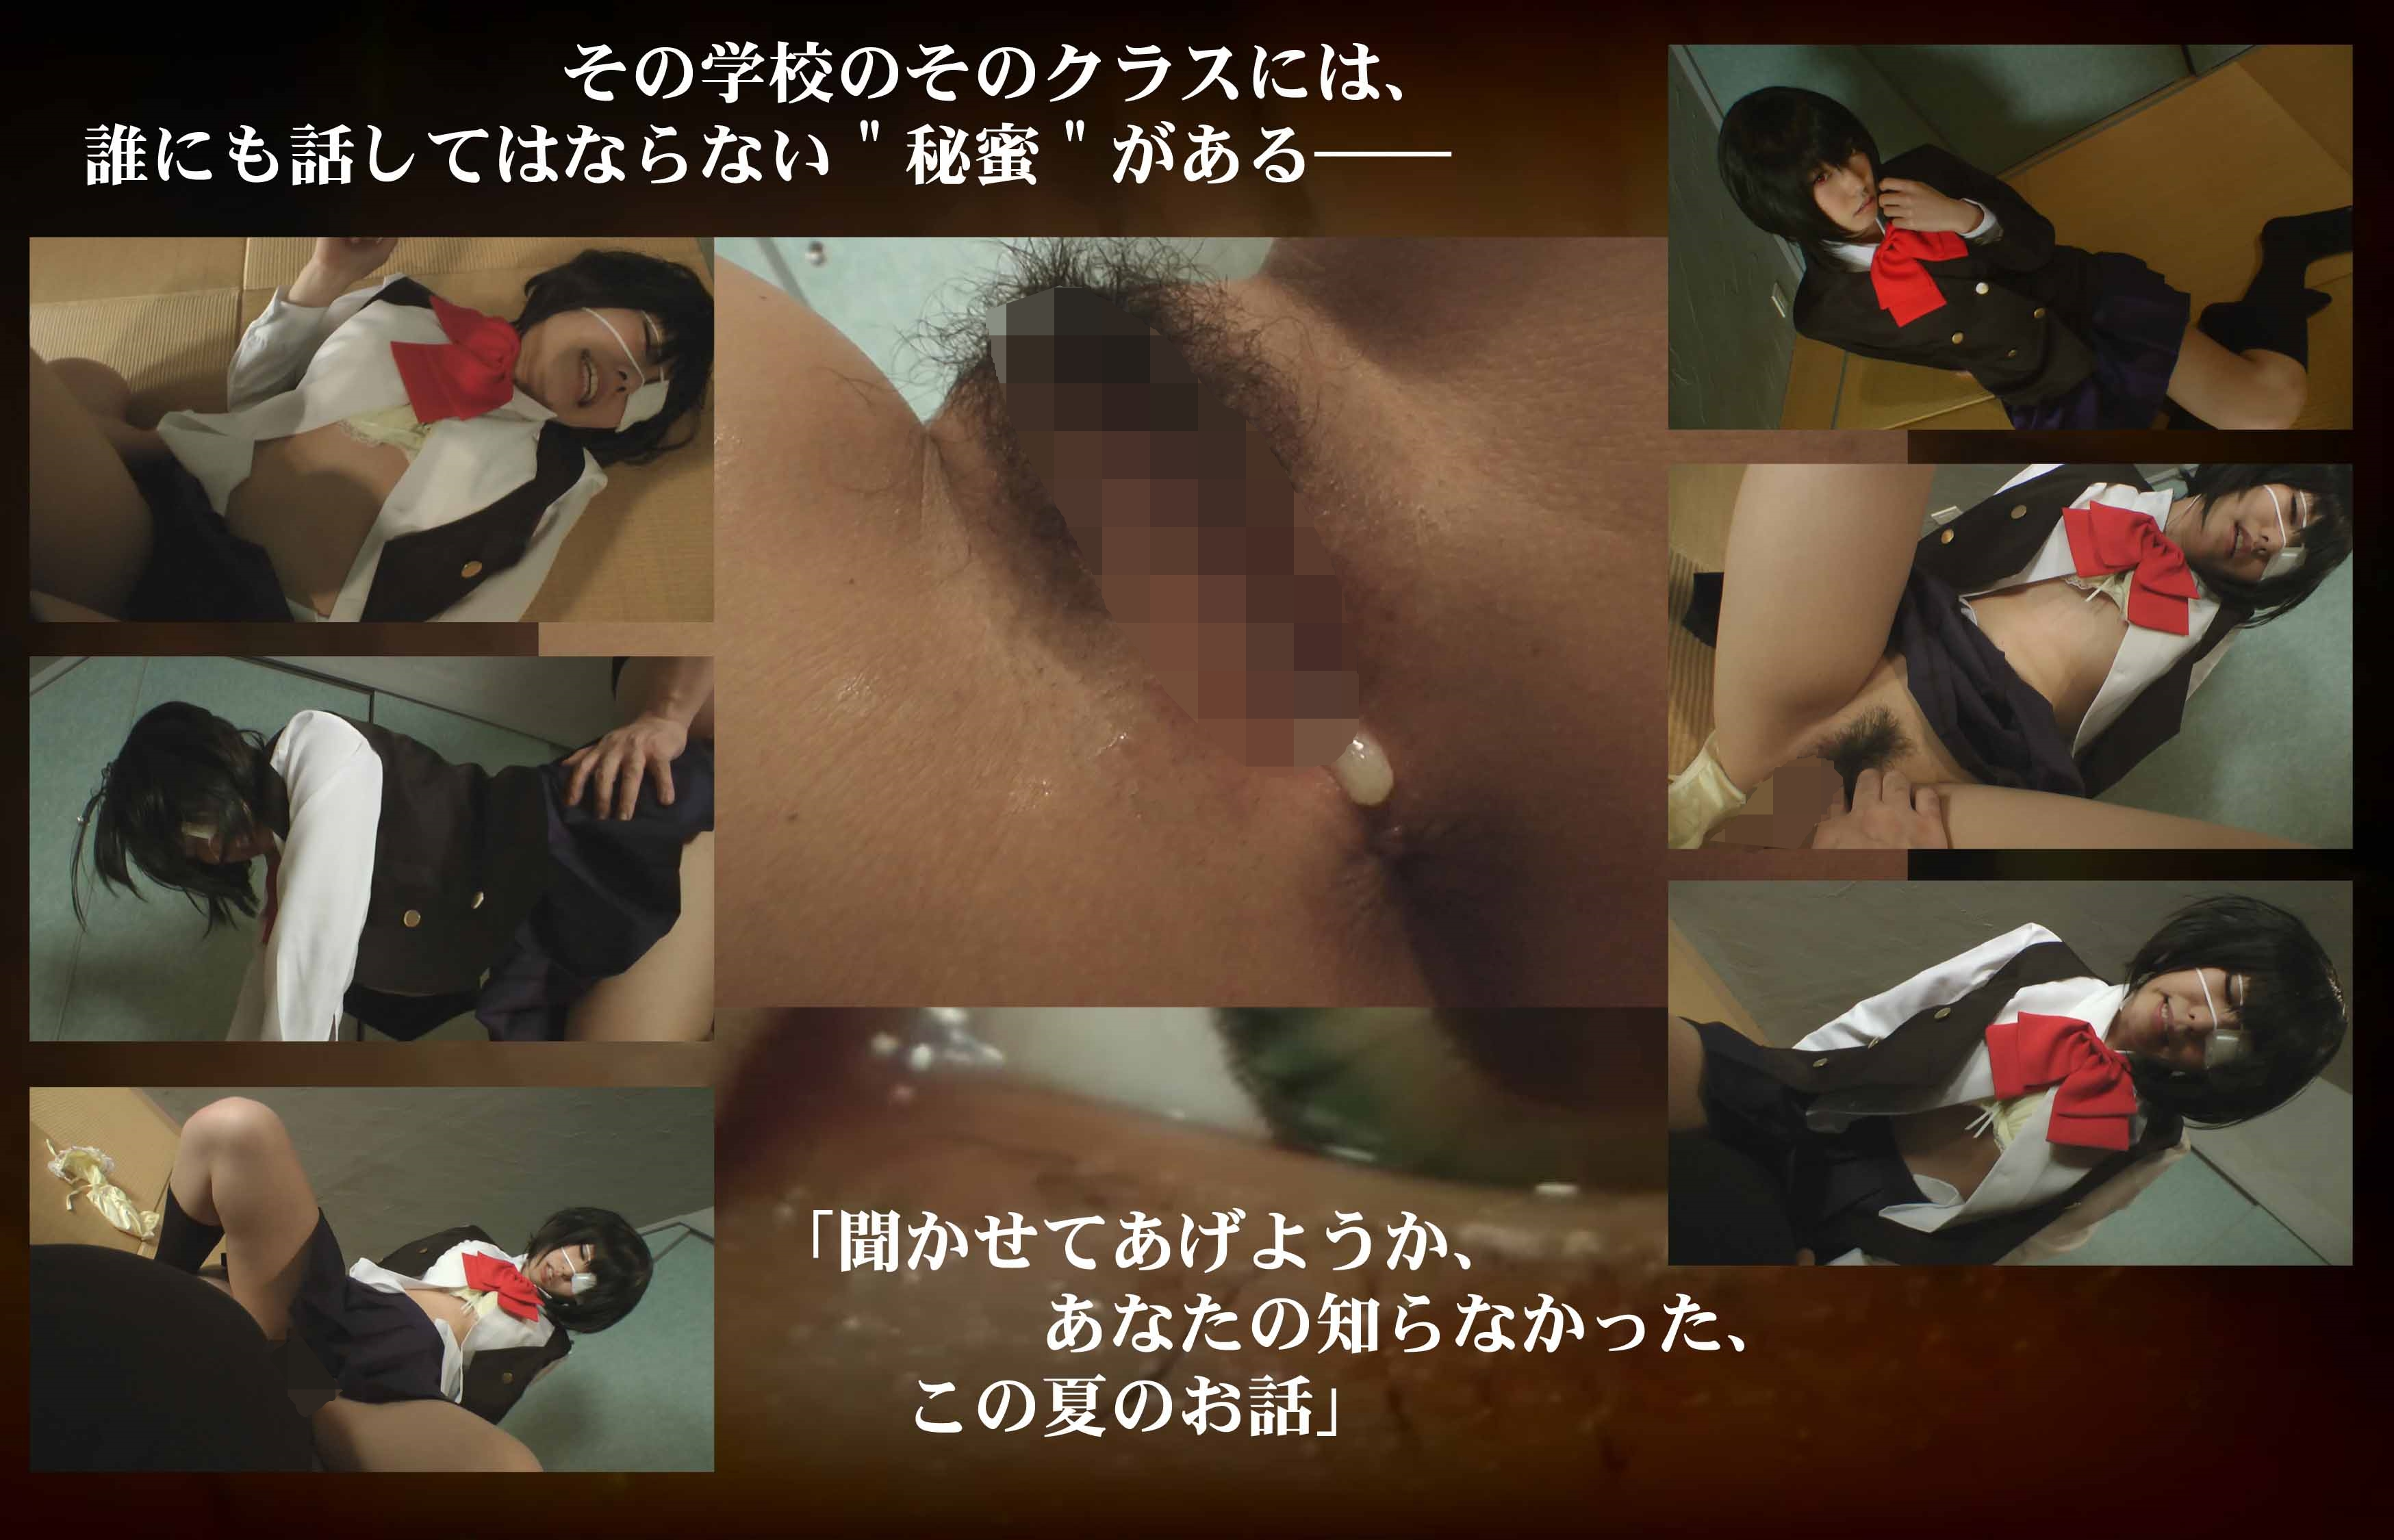 眼帯美少女と生中性交 episode SEX